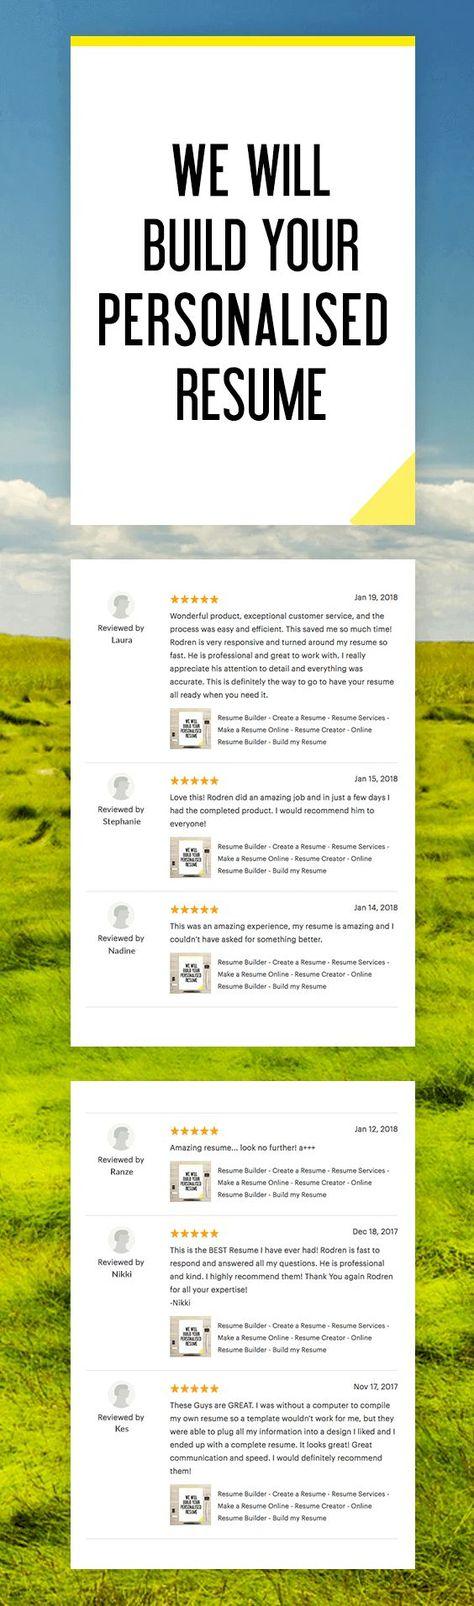 Best 25+ Online resume builder ideas on Pinterest Resume builder - online resume builder